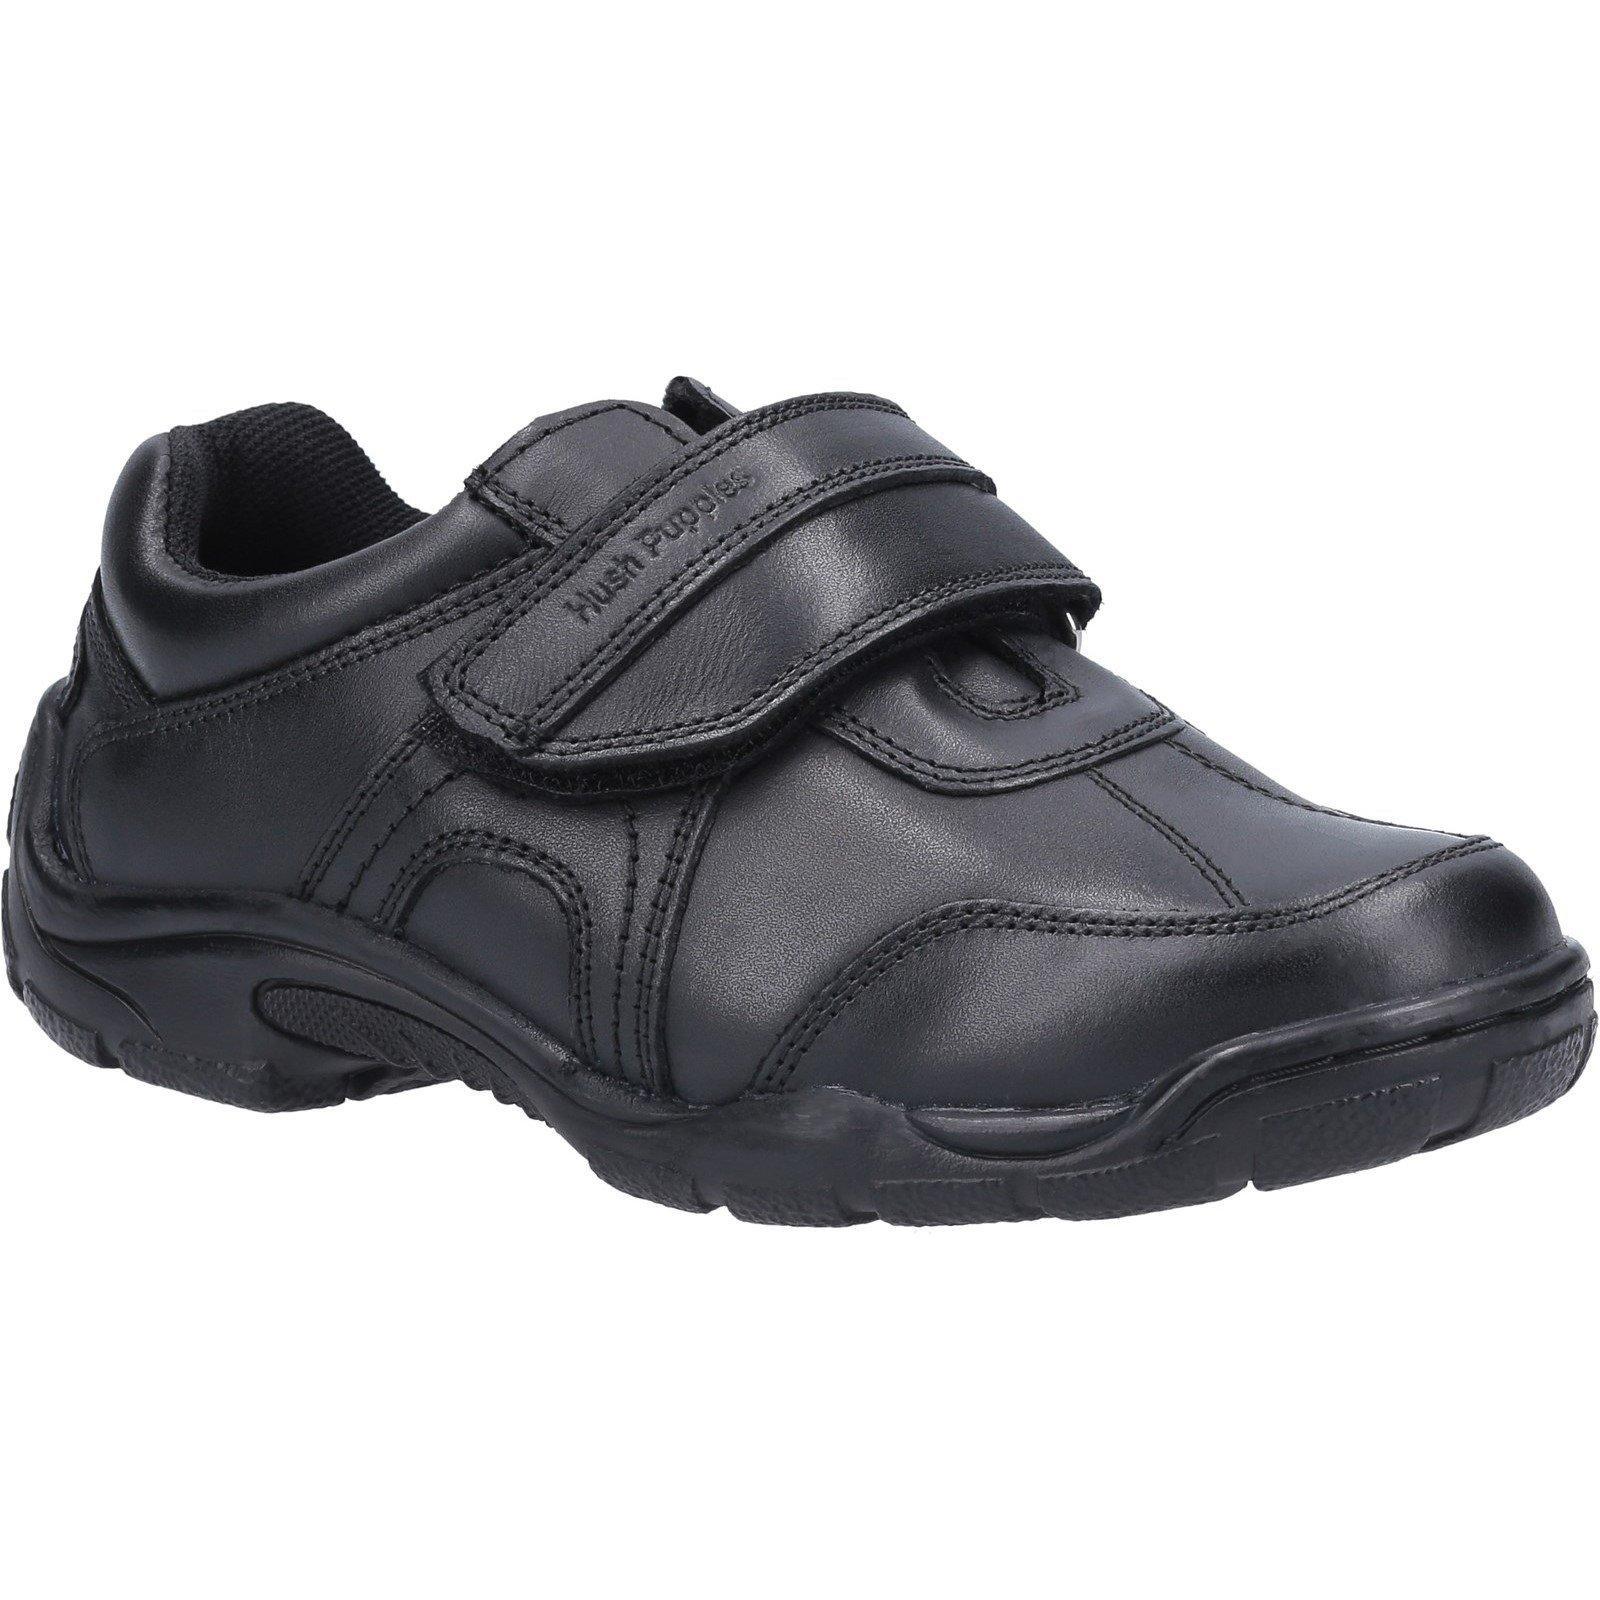 Hush Puppies Kid's Arlo Junior School Shoe Black 30853 - Black 1